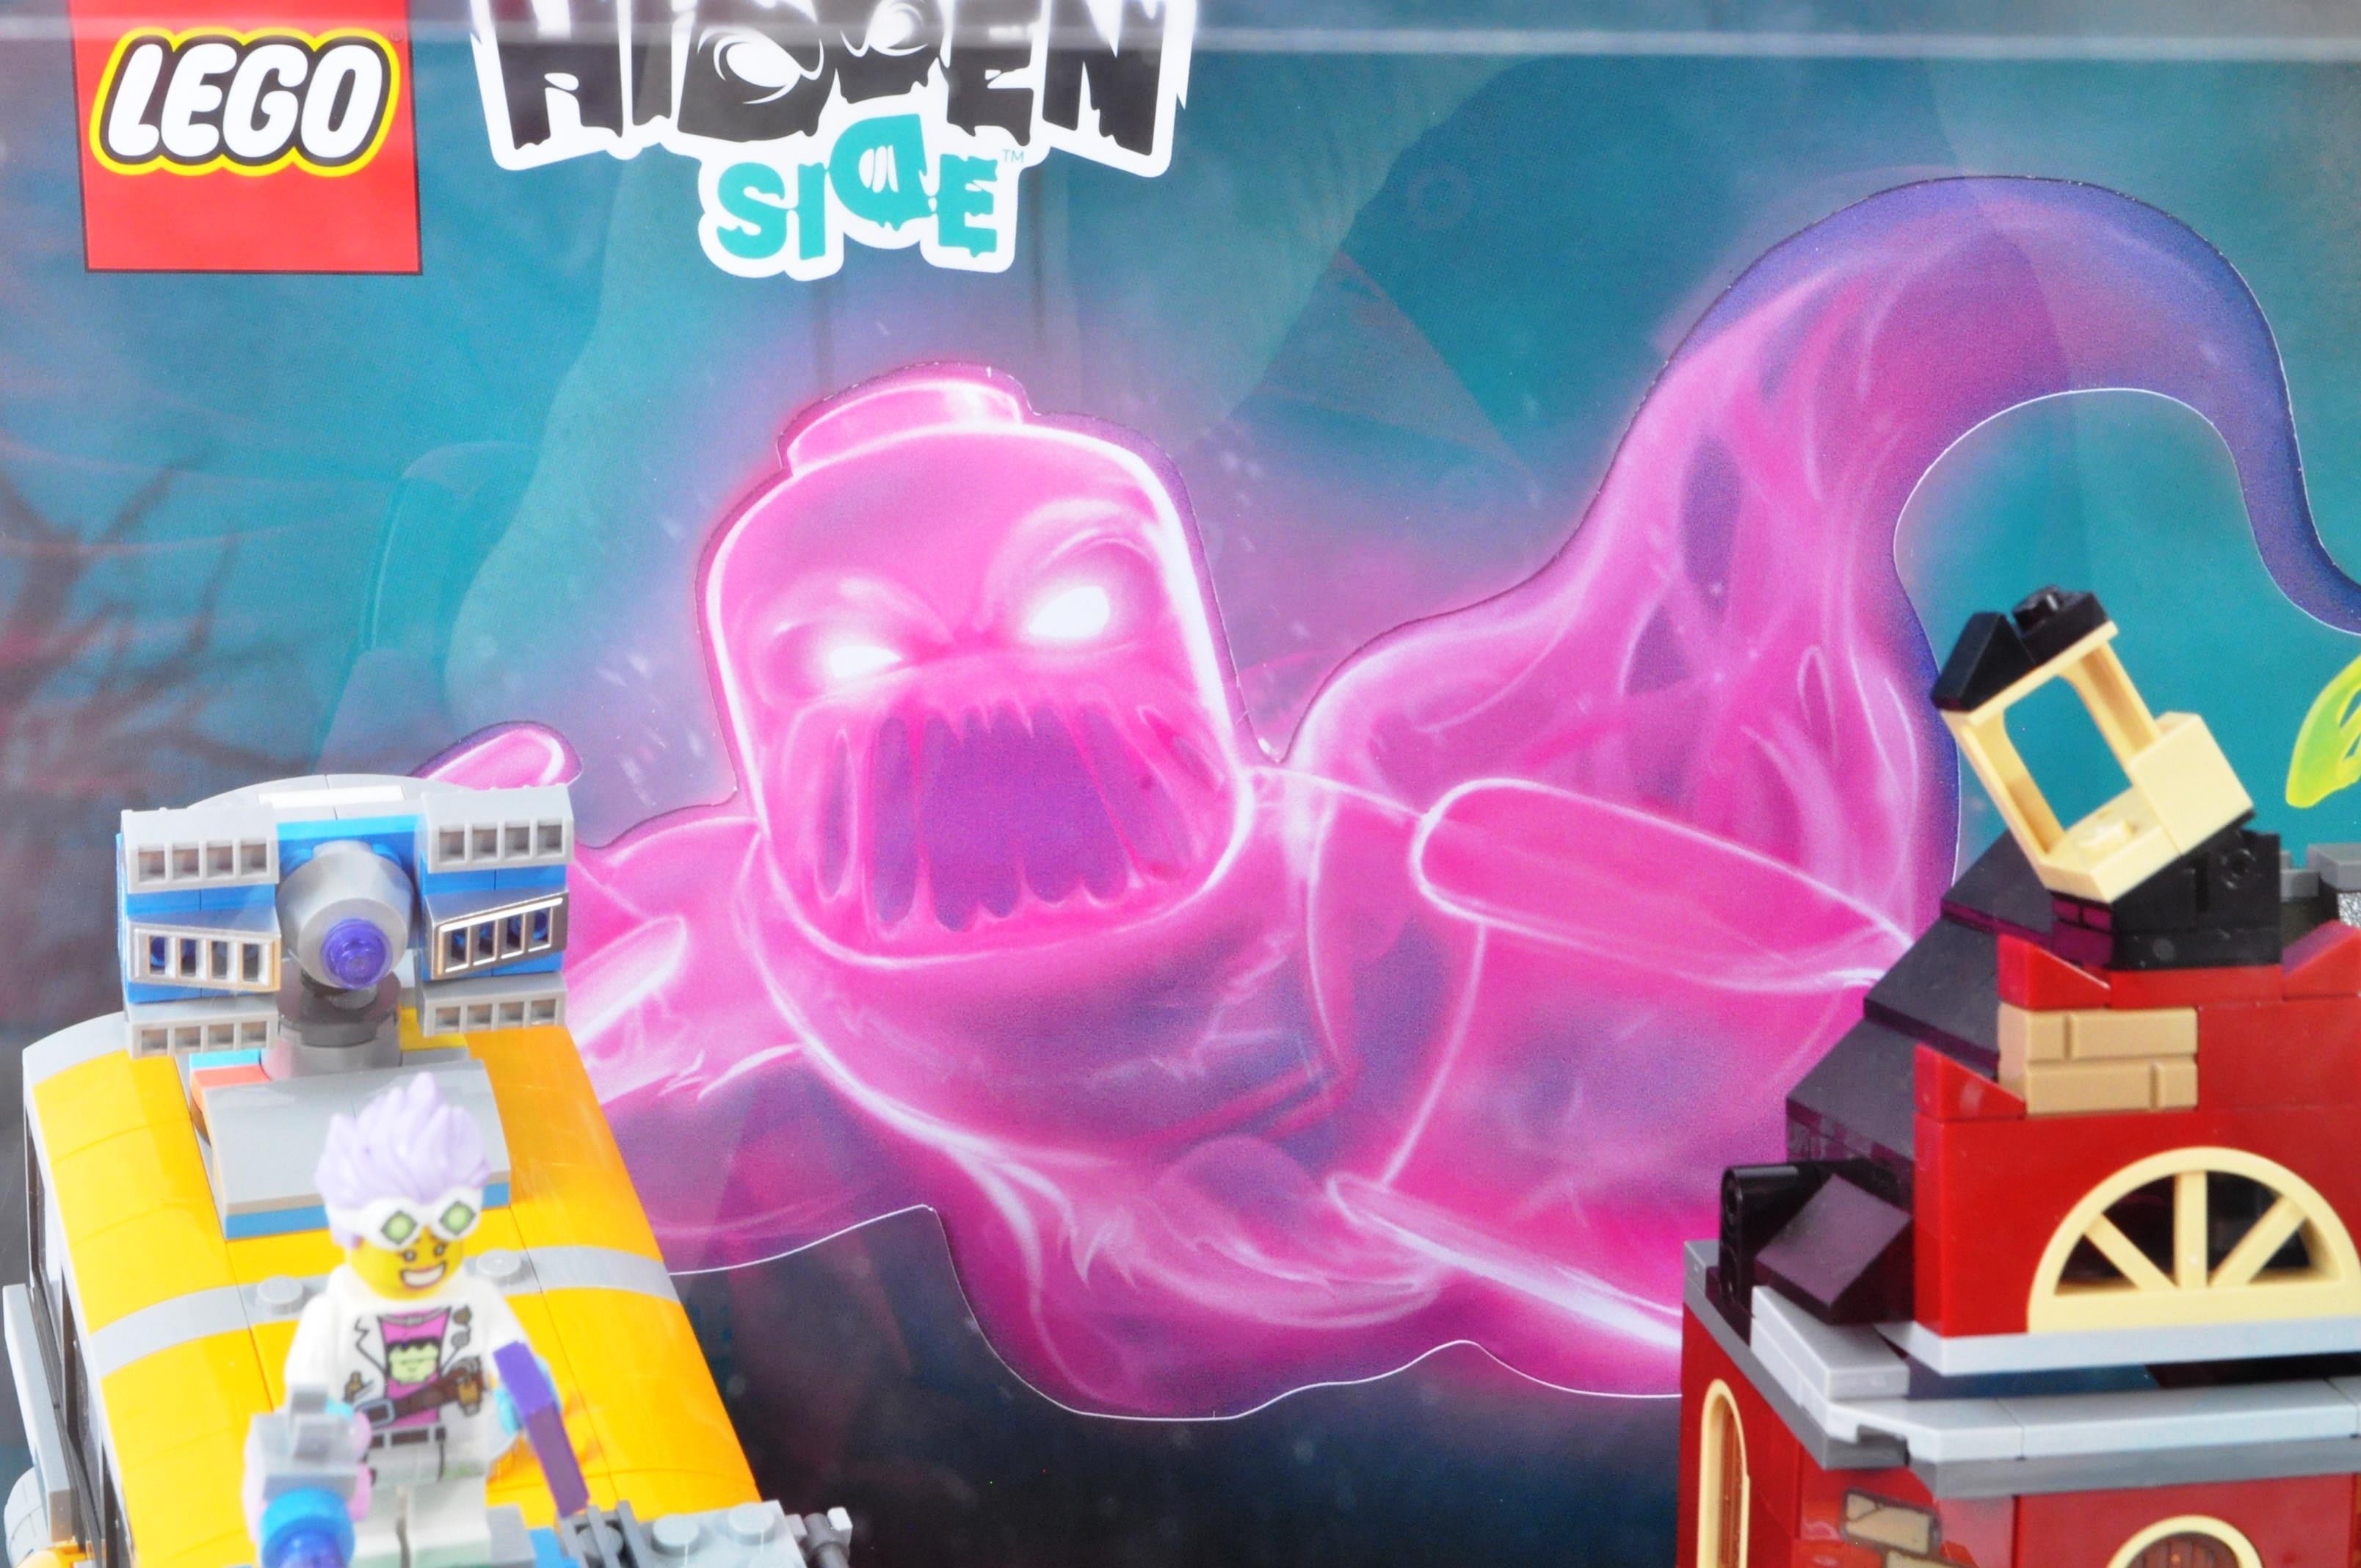 LEGO - HIDDEN SIDE - ORIGINAL IN STORE SHOP DISPLAY CABINET - Image 2 of 8